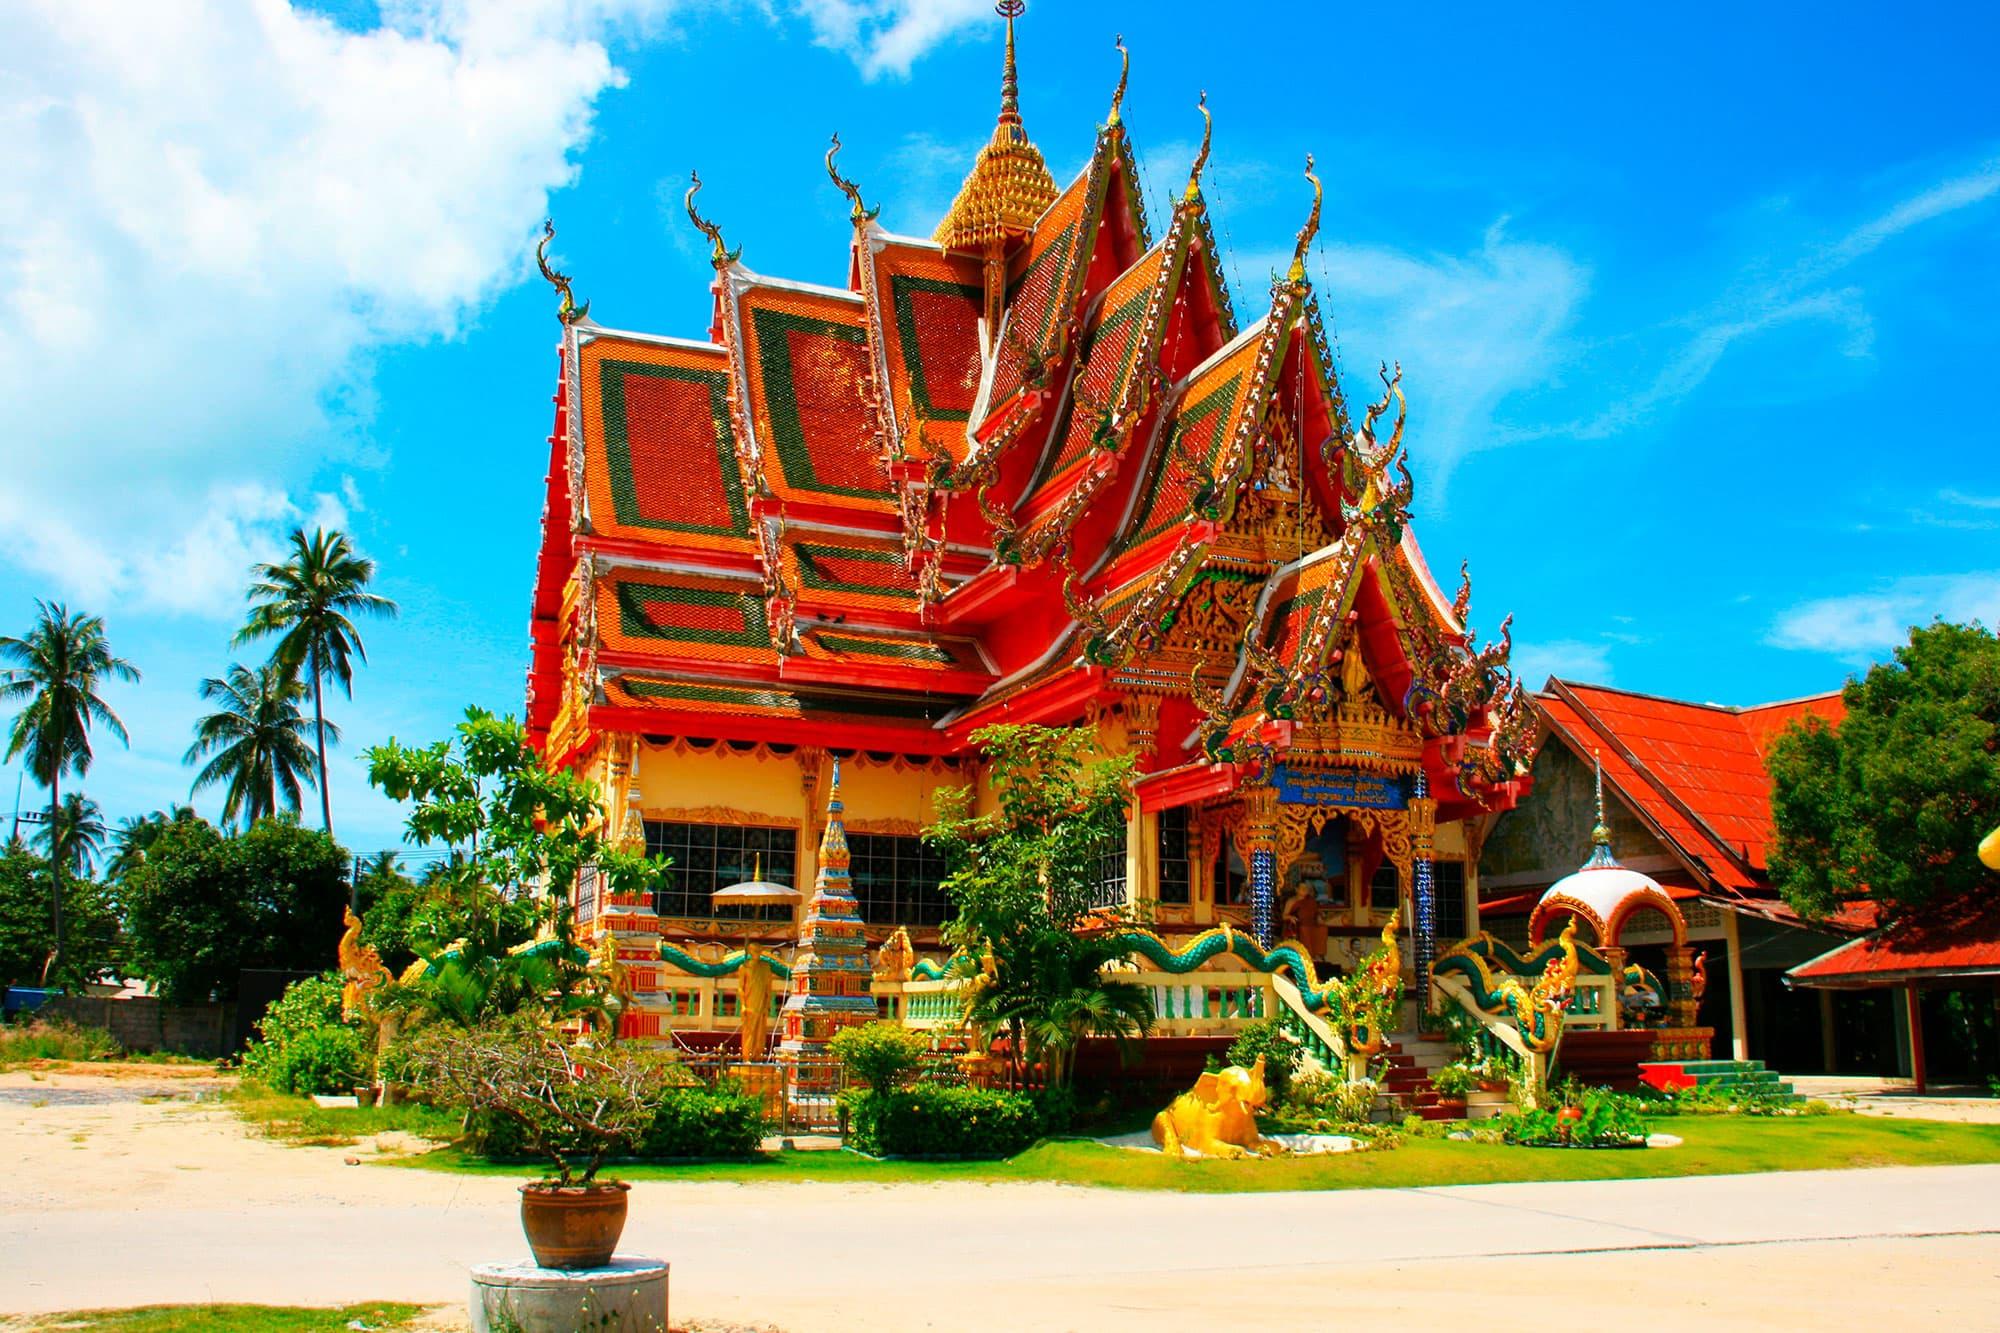 Quintaesencia de Asia - Vietnam- imagen #8